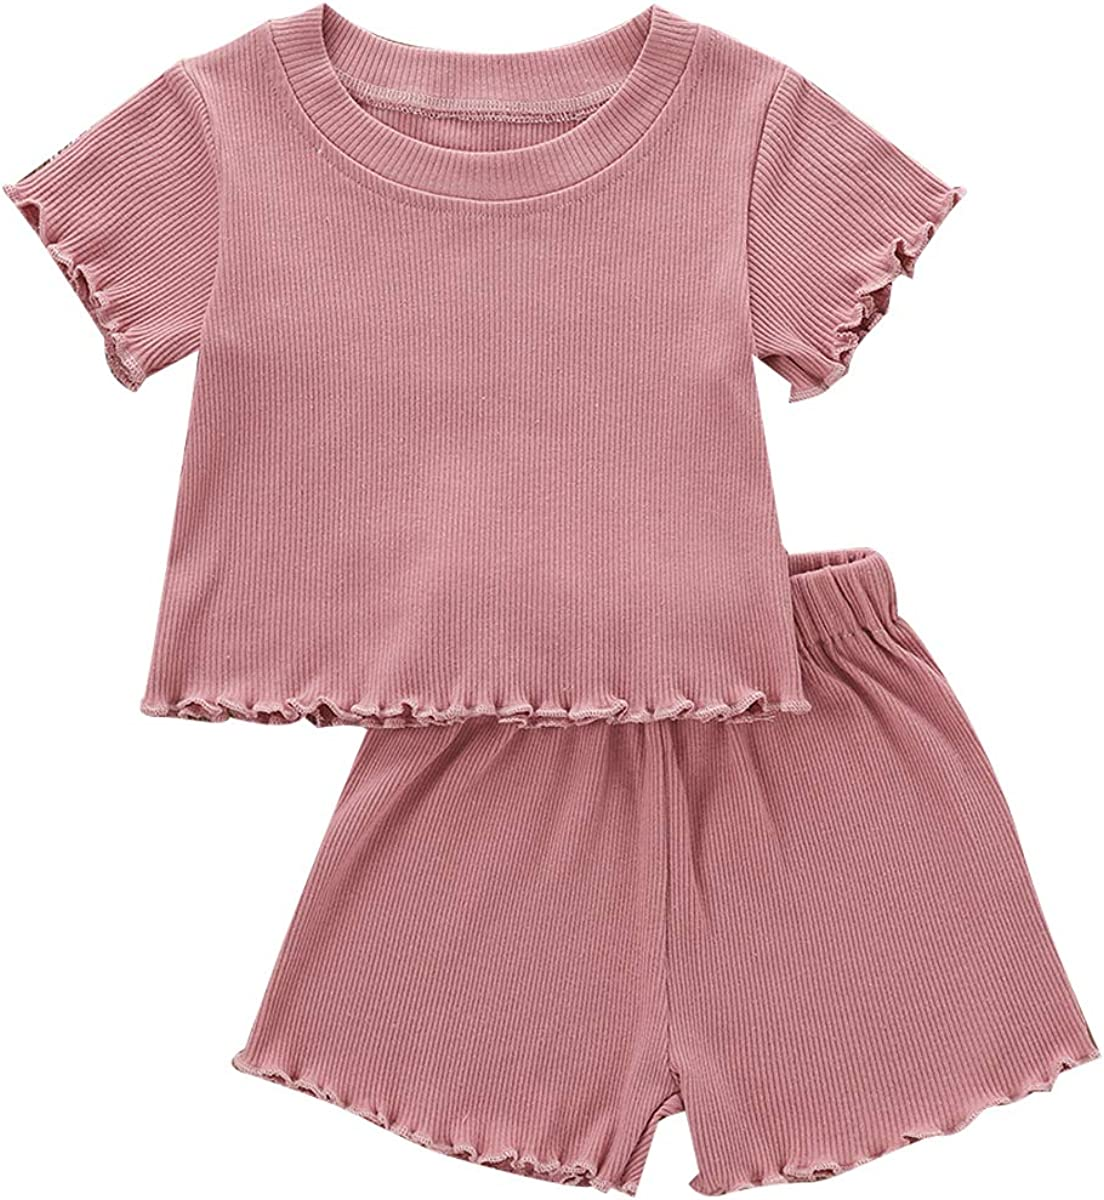 Toddler Newborn Unisex Baby Short Sleeve Pullover T-Shirt Tops S